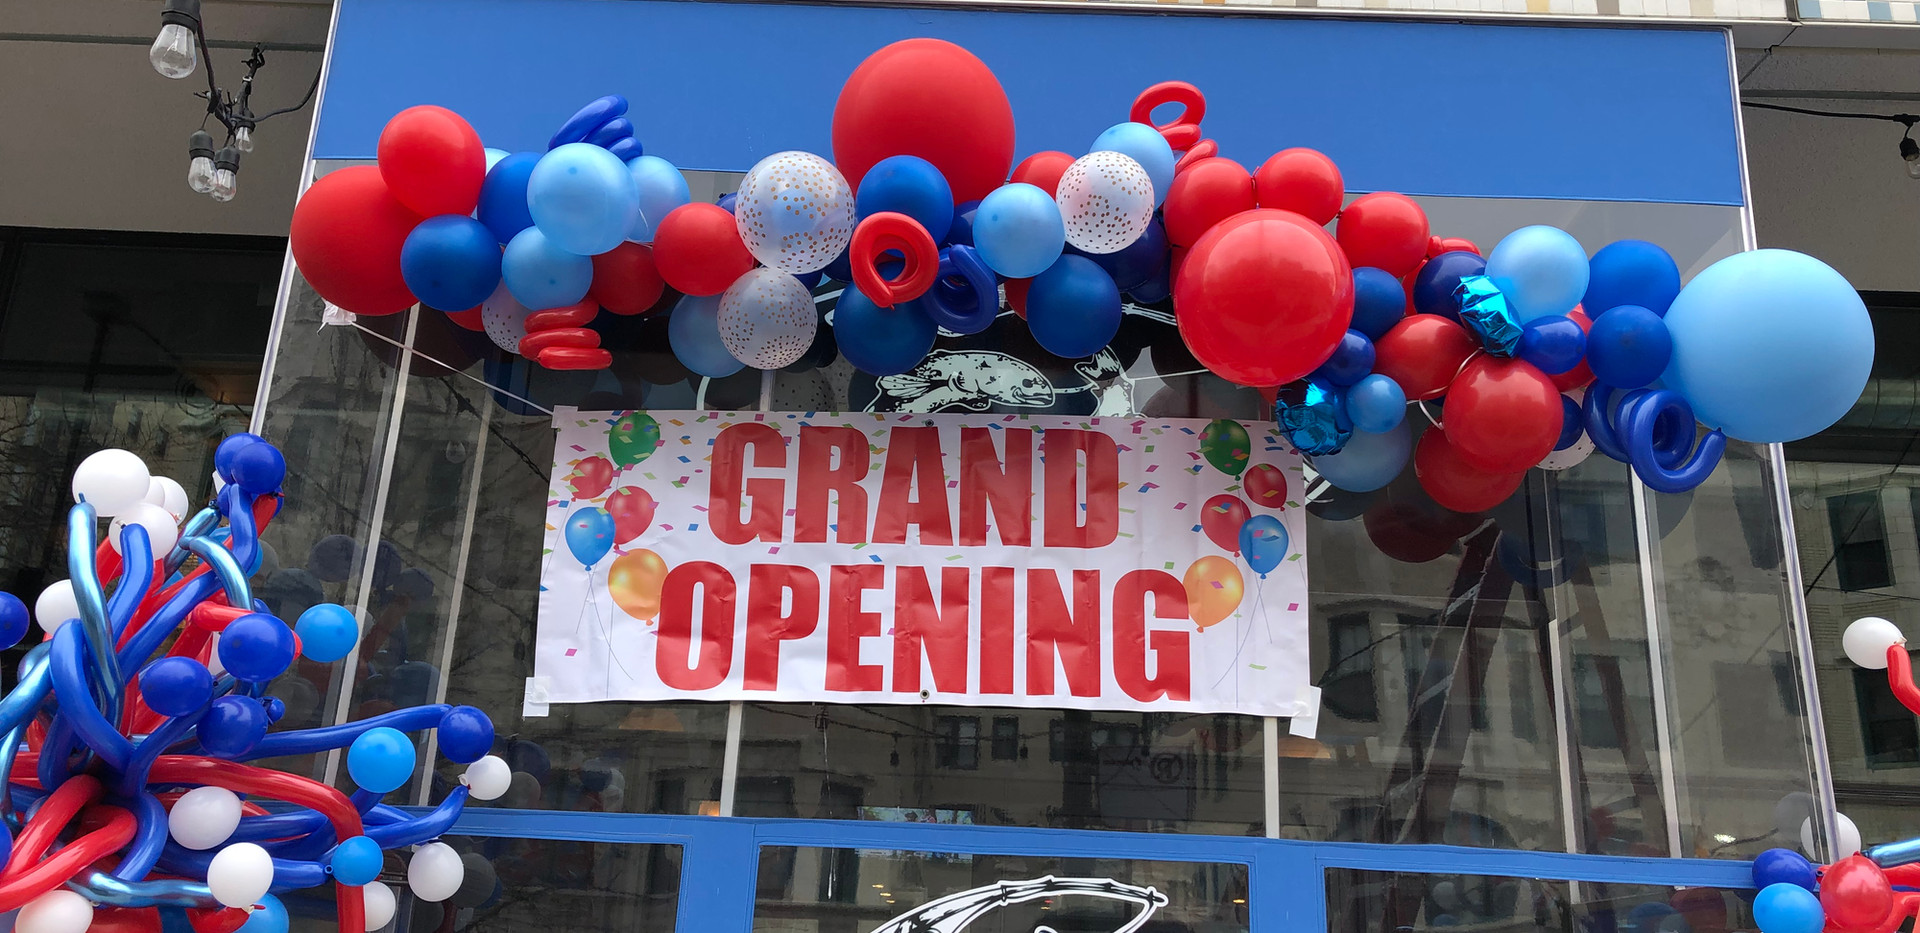 Grand Openign balloons